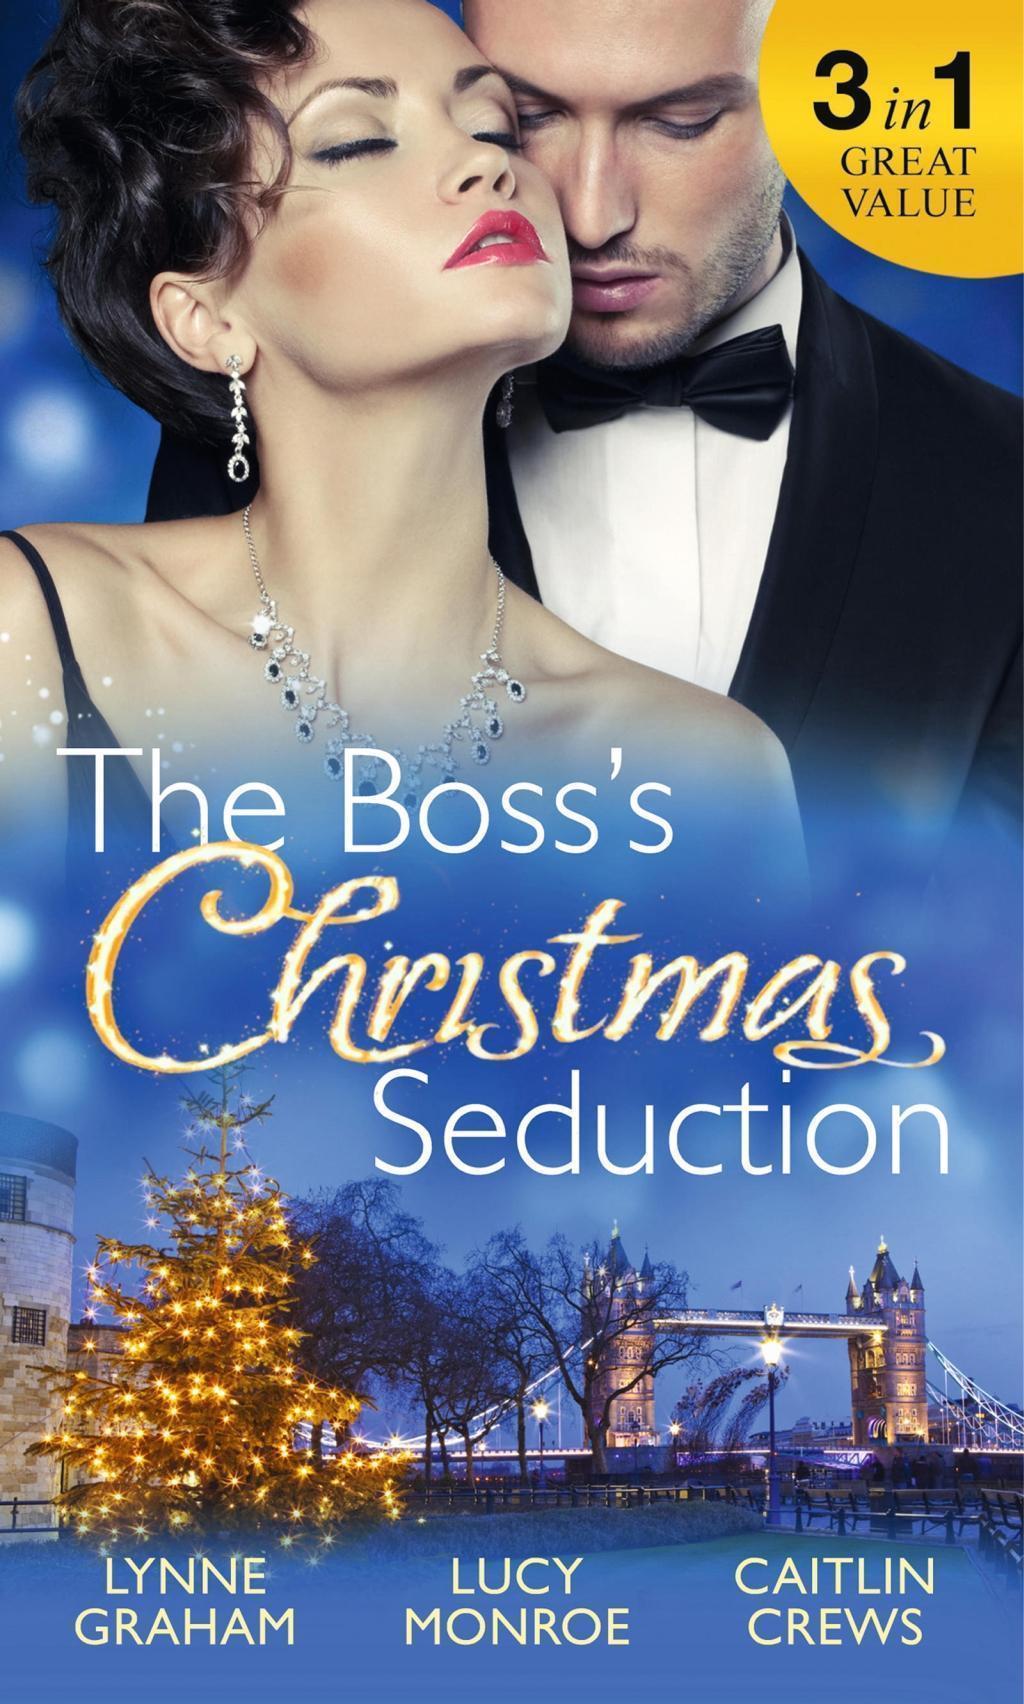 The Boss's Christmas Seduction: Unlocking her Innocence / Million Dollar Christmas Proposal / Not Just the Boss's Plaything (Mills & Boon M&B)